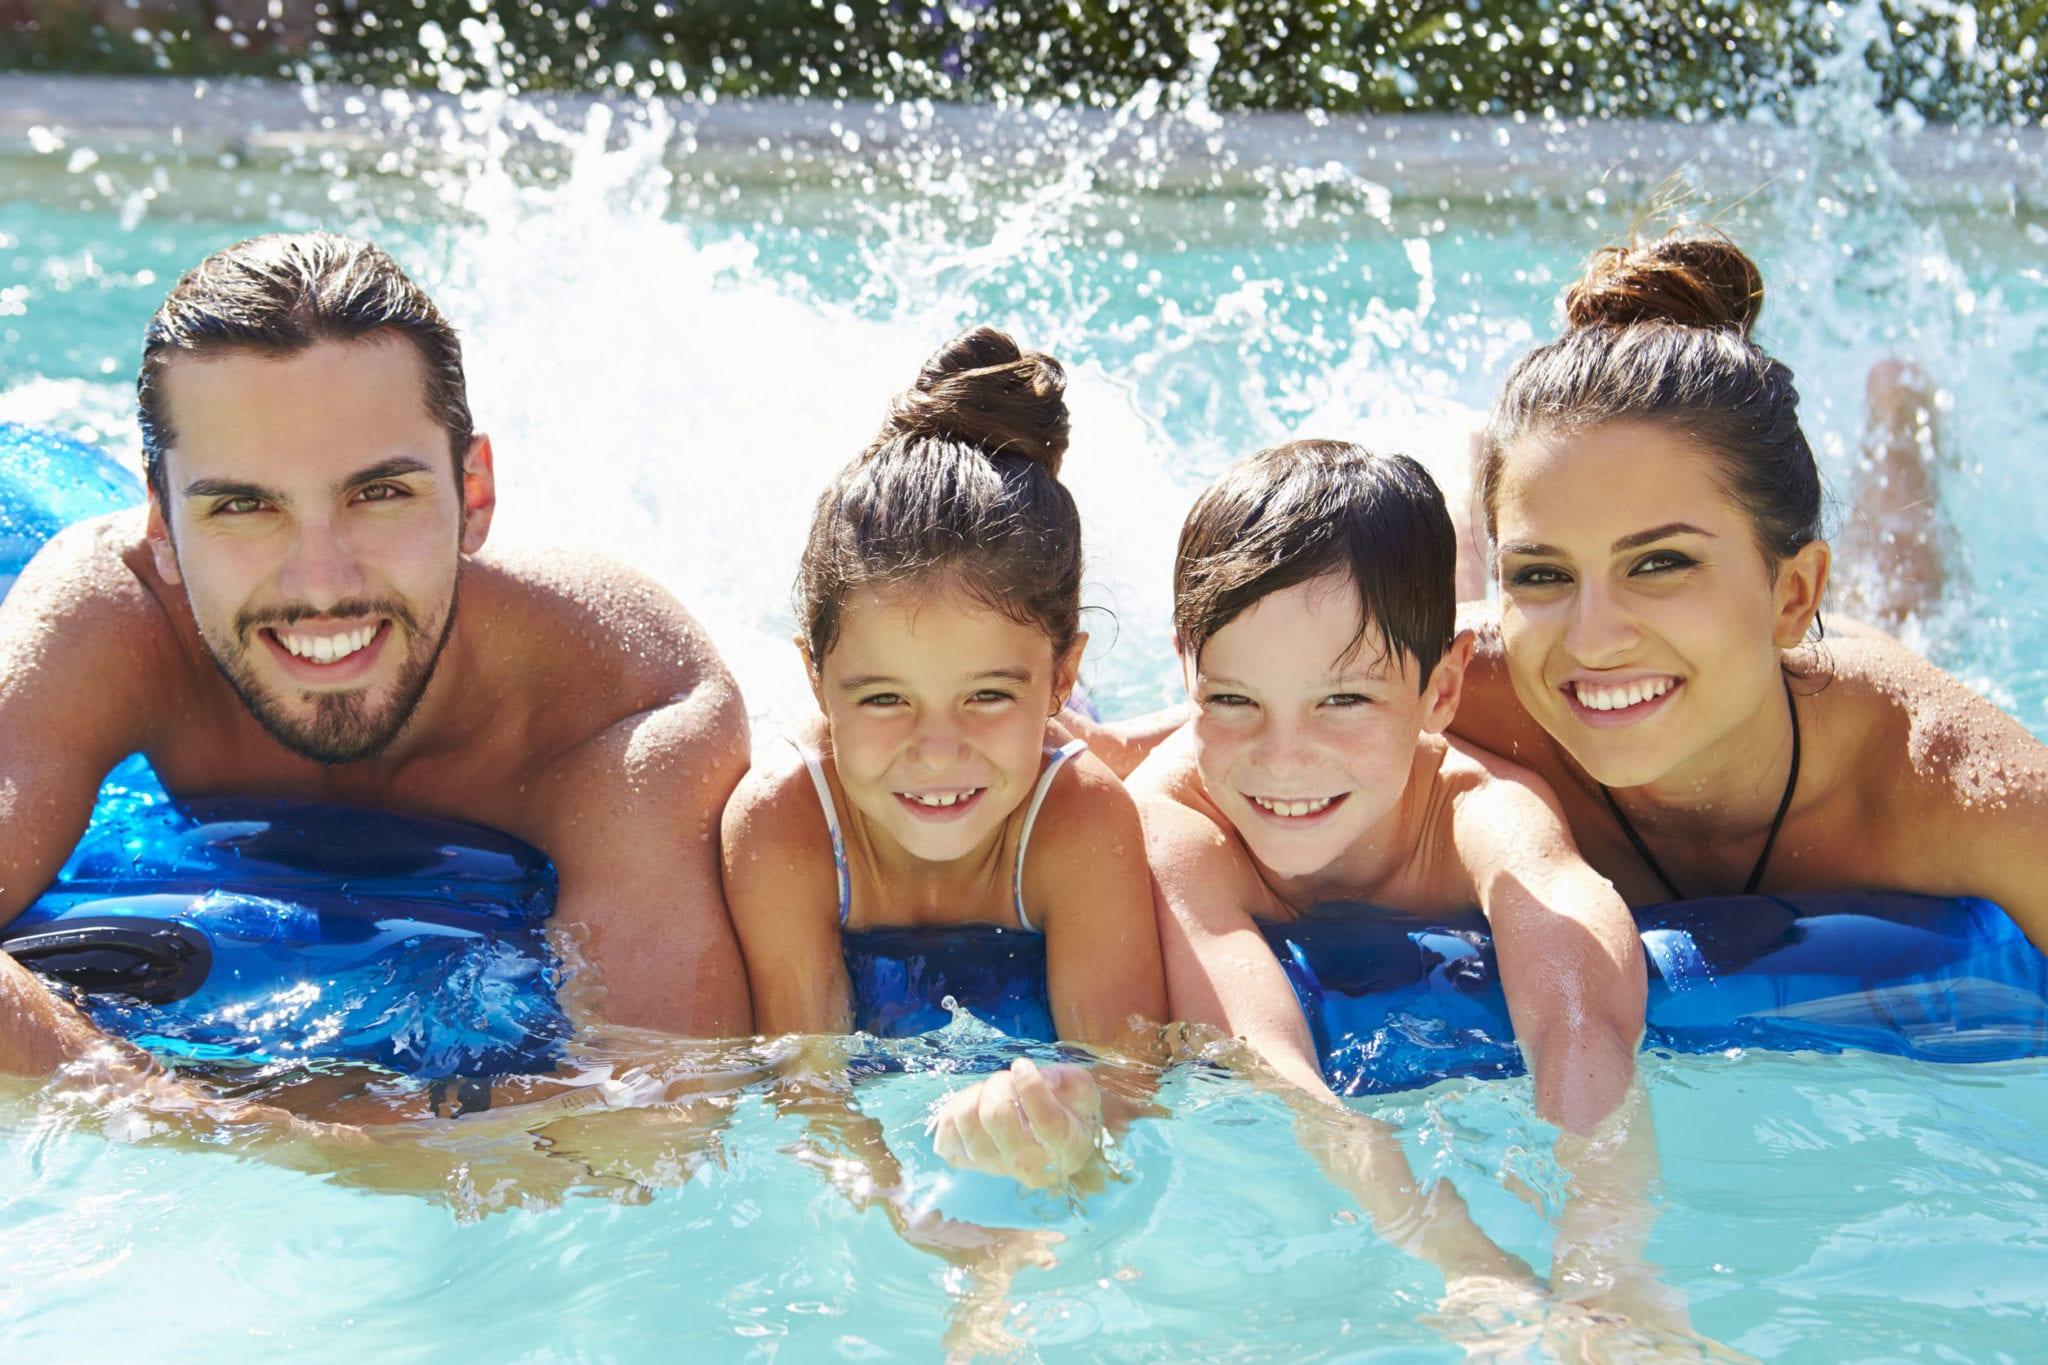 Fort Worth Swimming Pool Injury Lawyers